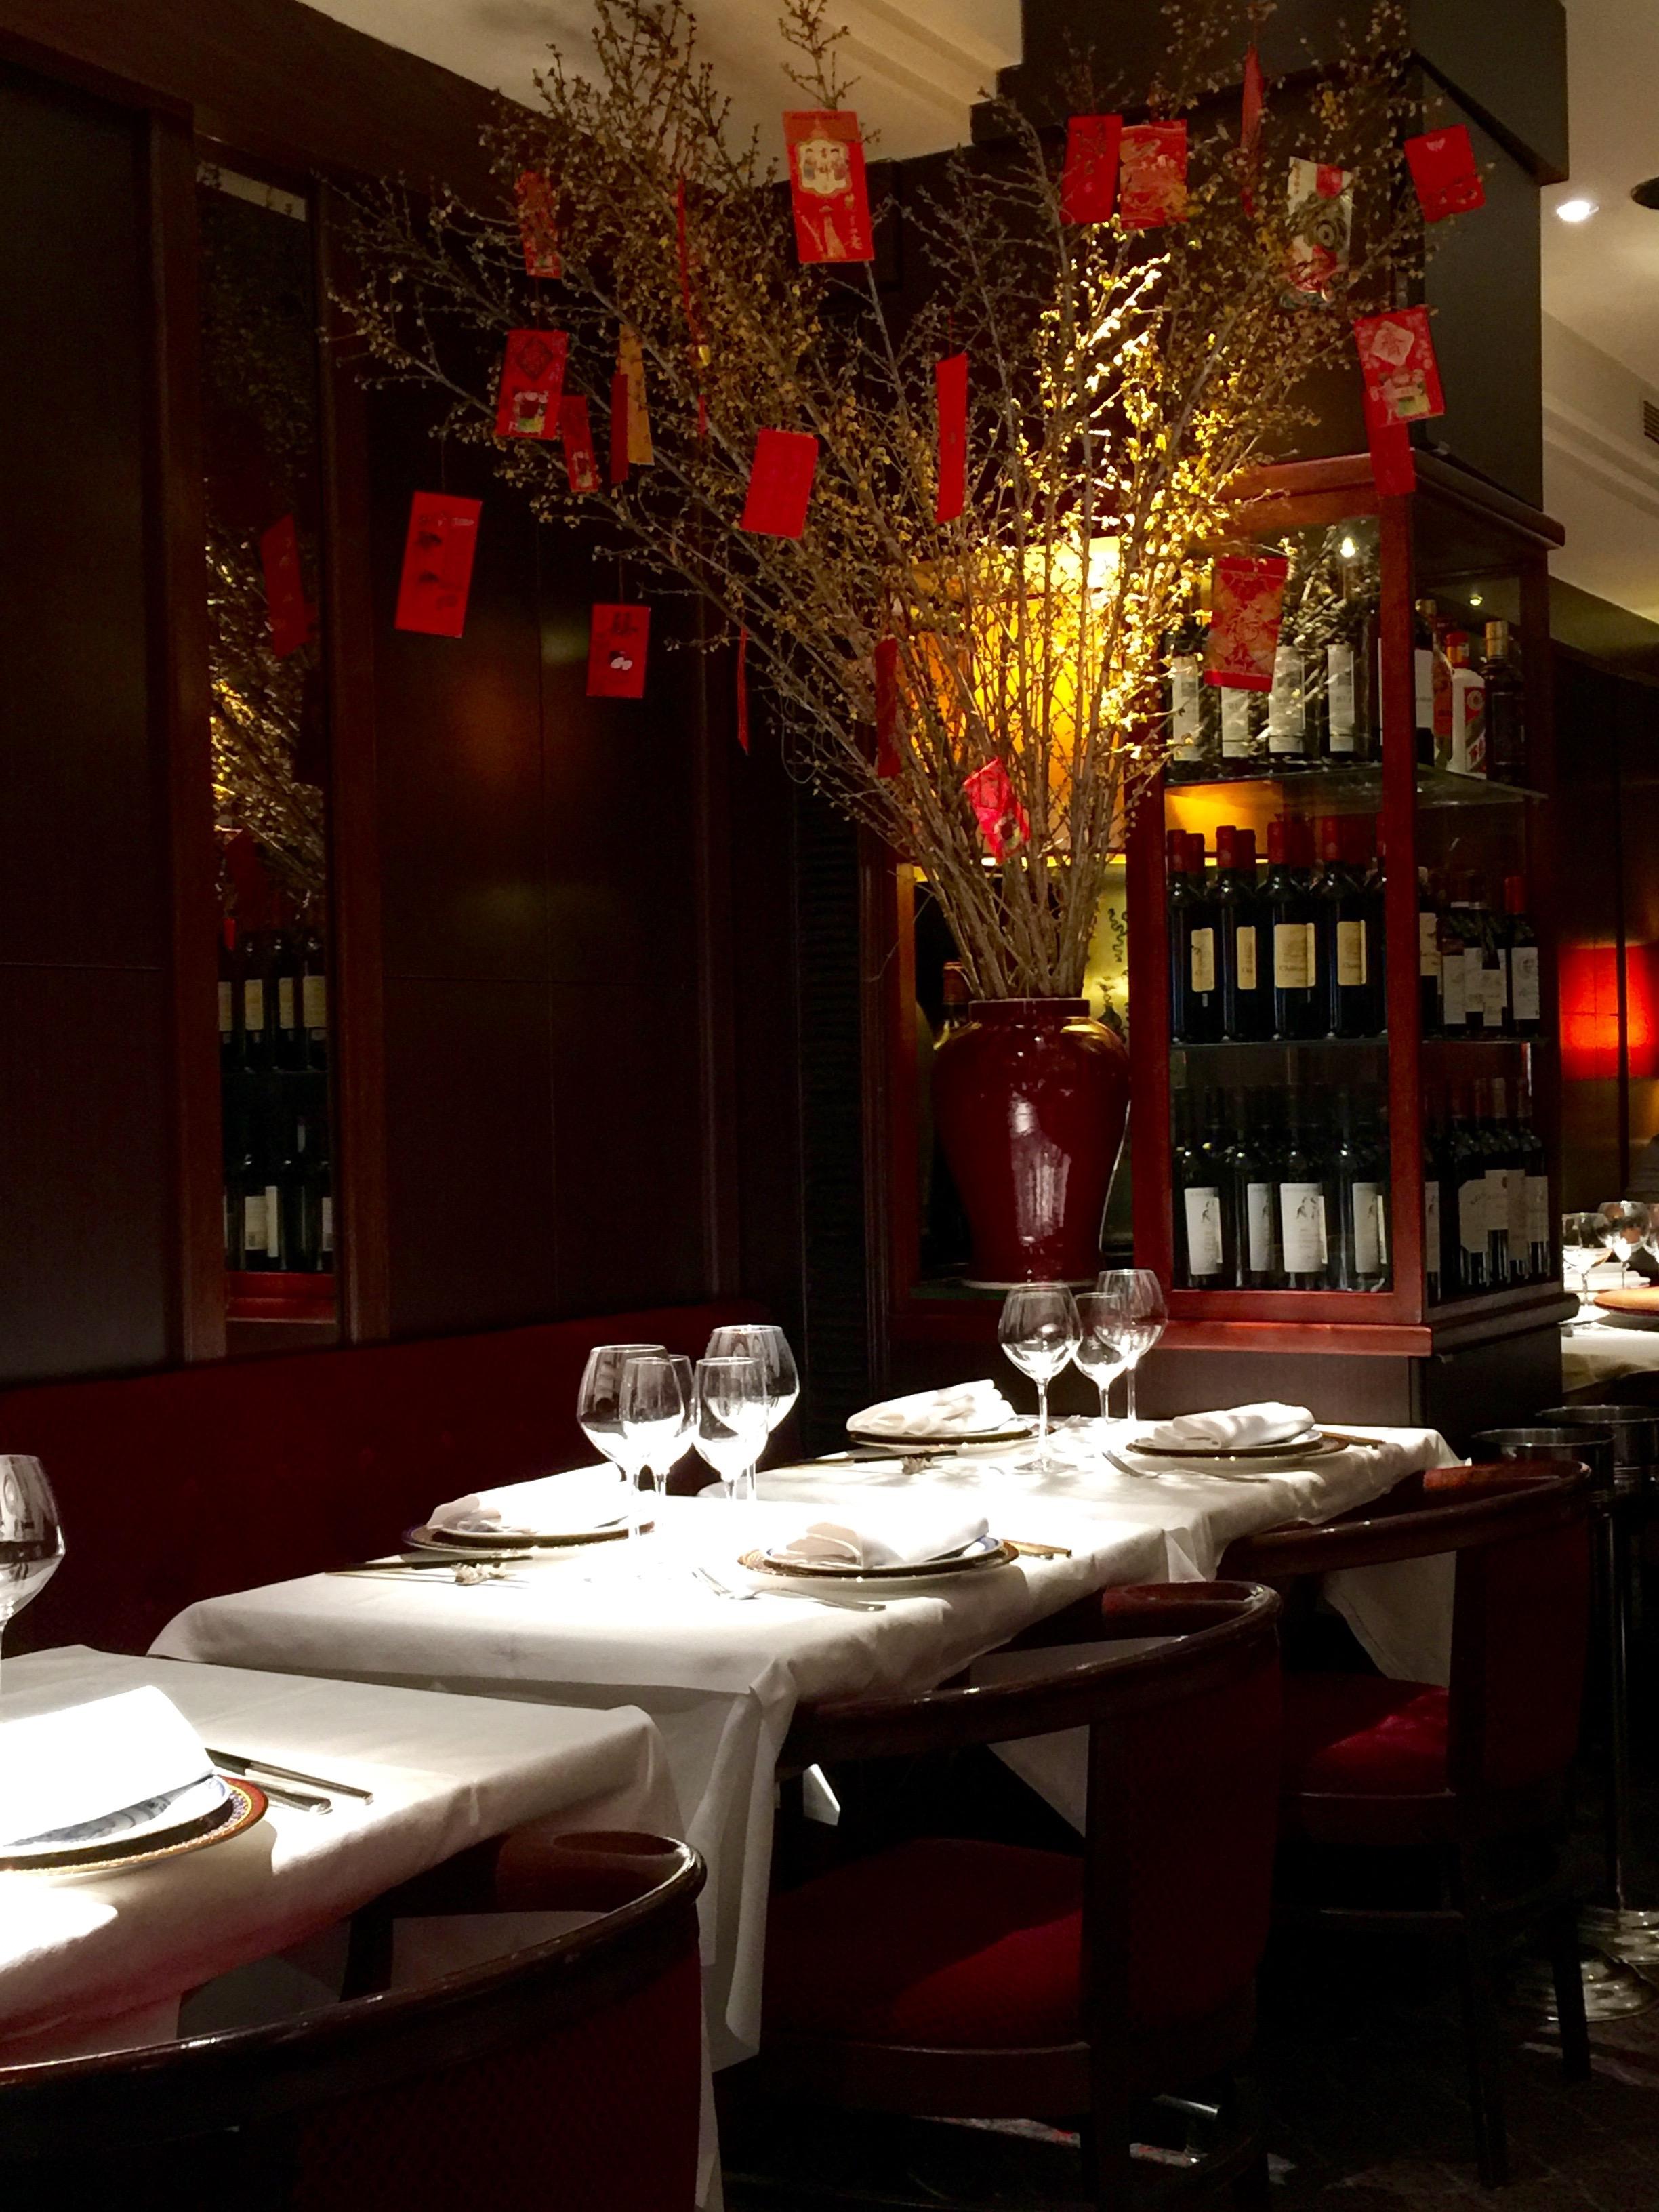 Restaurant Chinois Royal Cholet